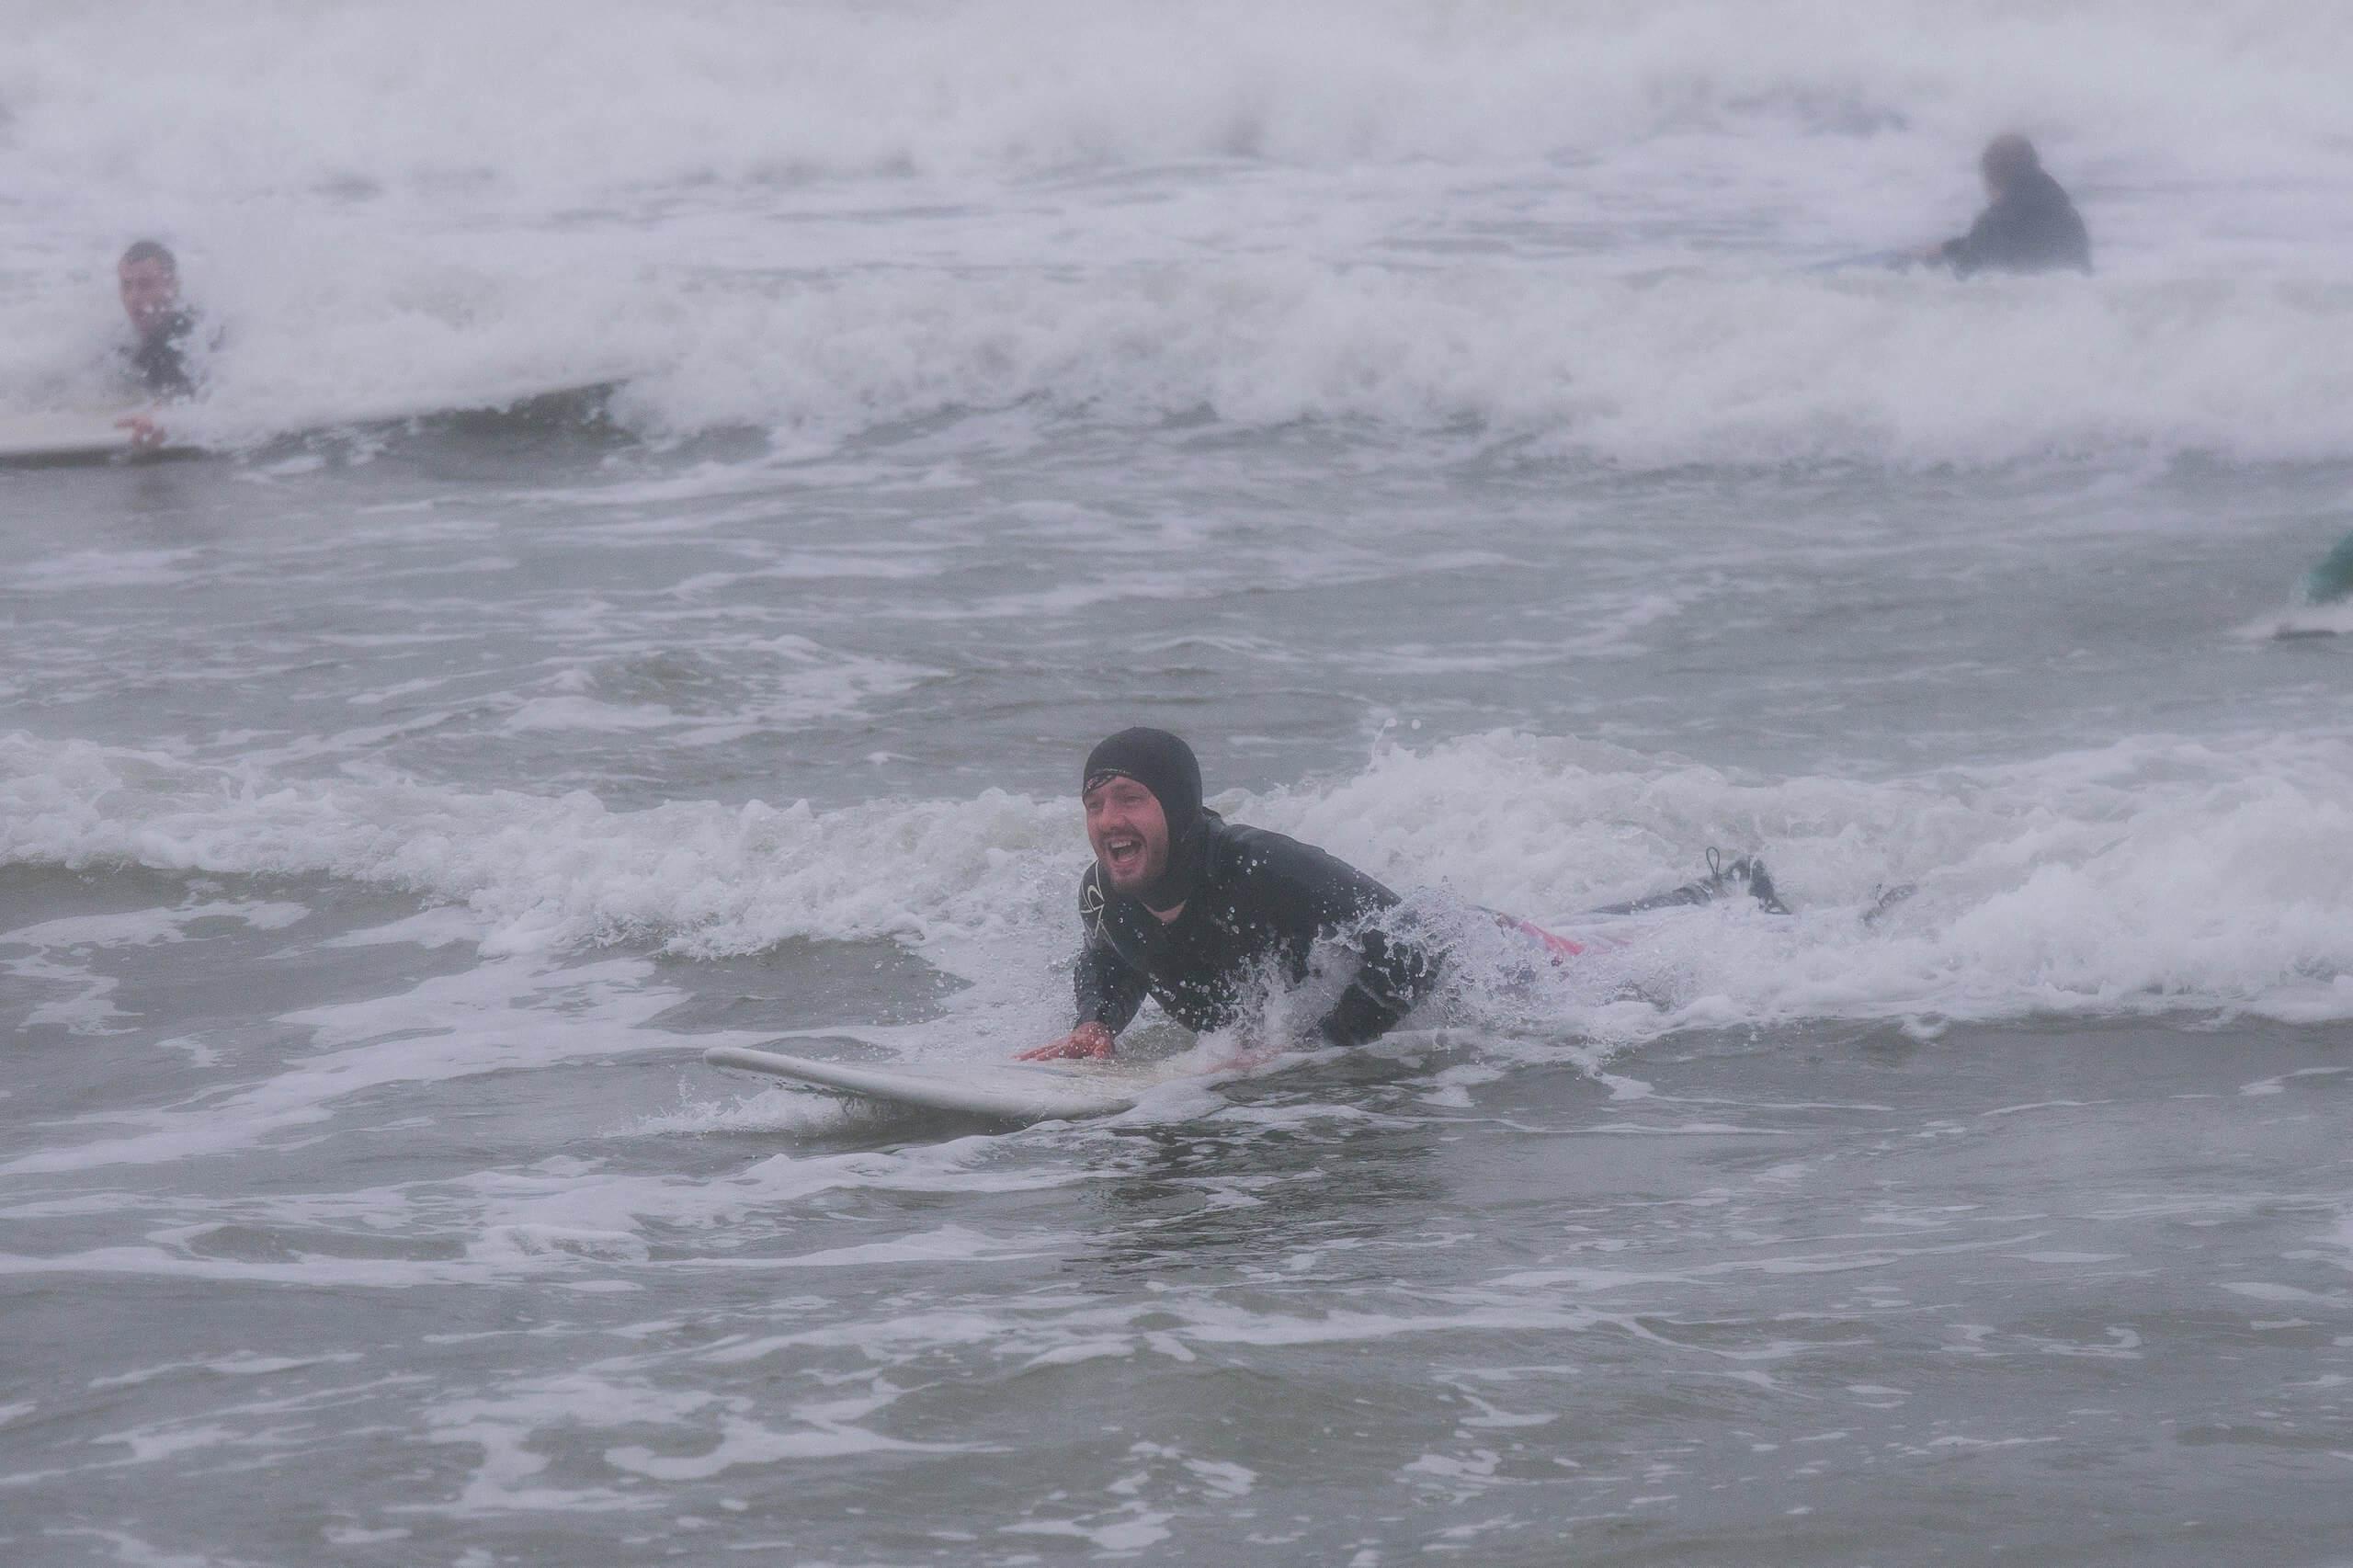 дмитрий пелин на серфинге вместе с проектом на грани